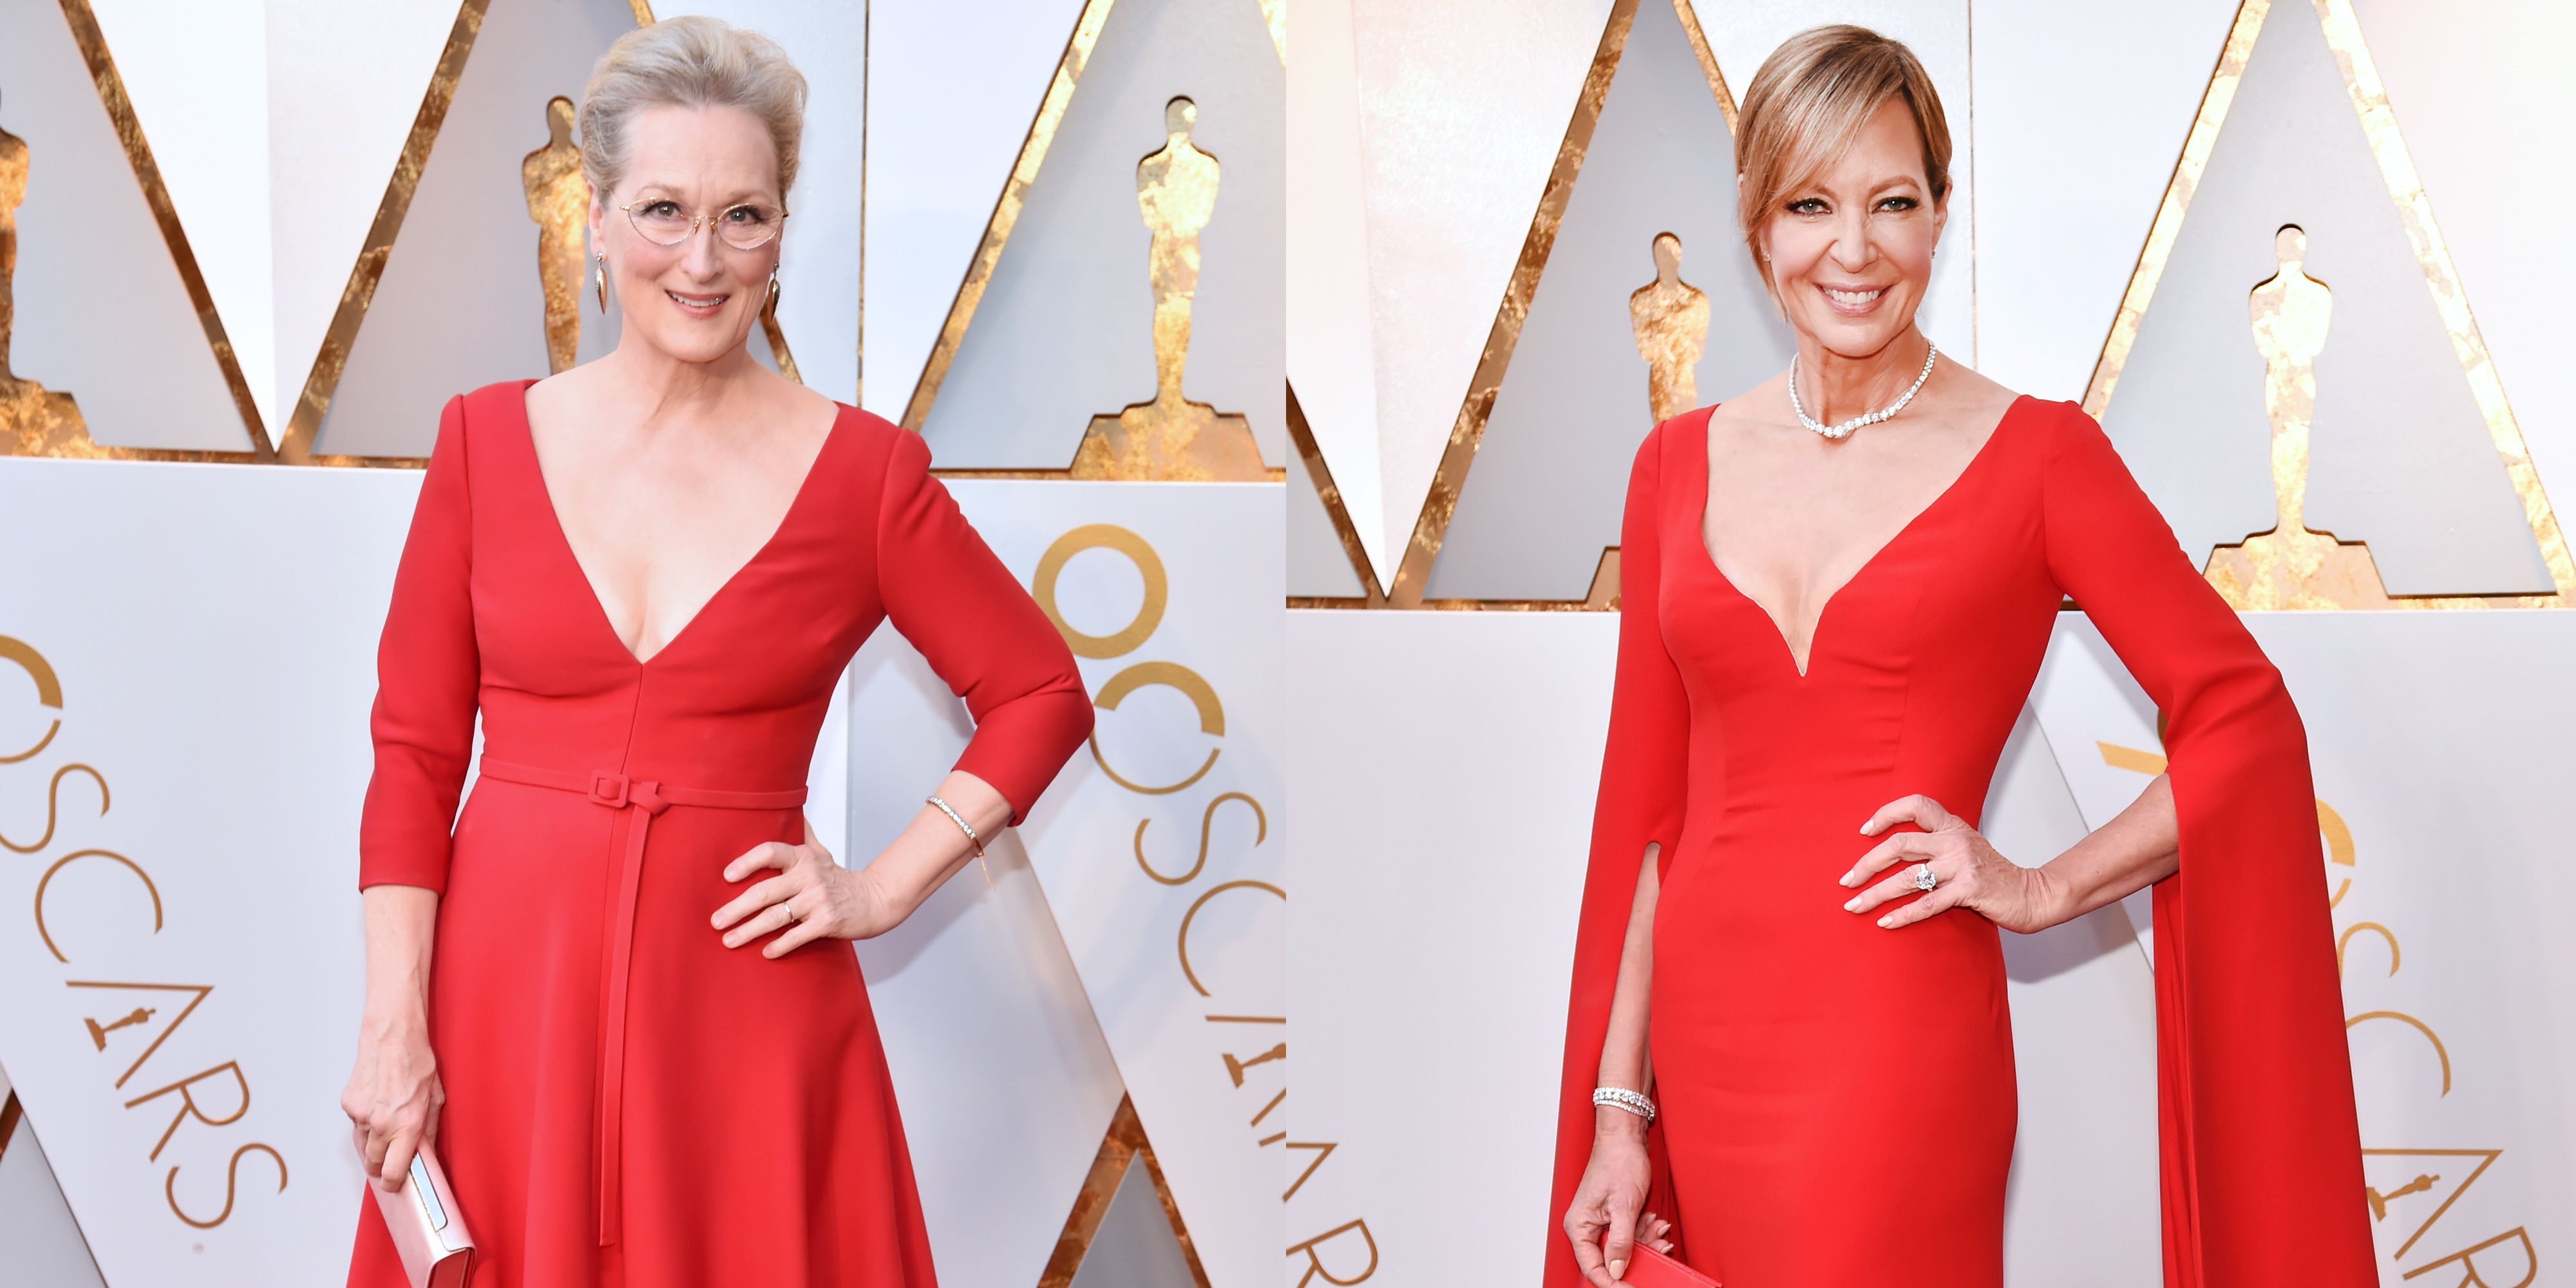 red carpet red look alike dresses